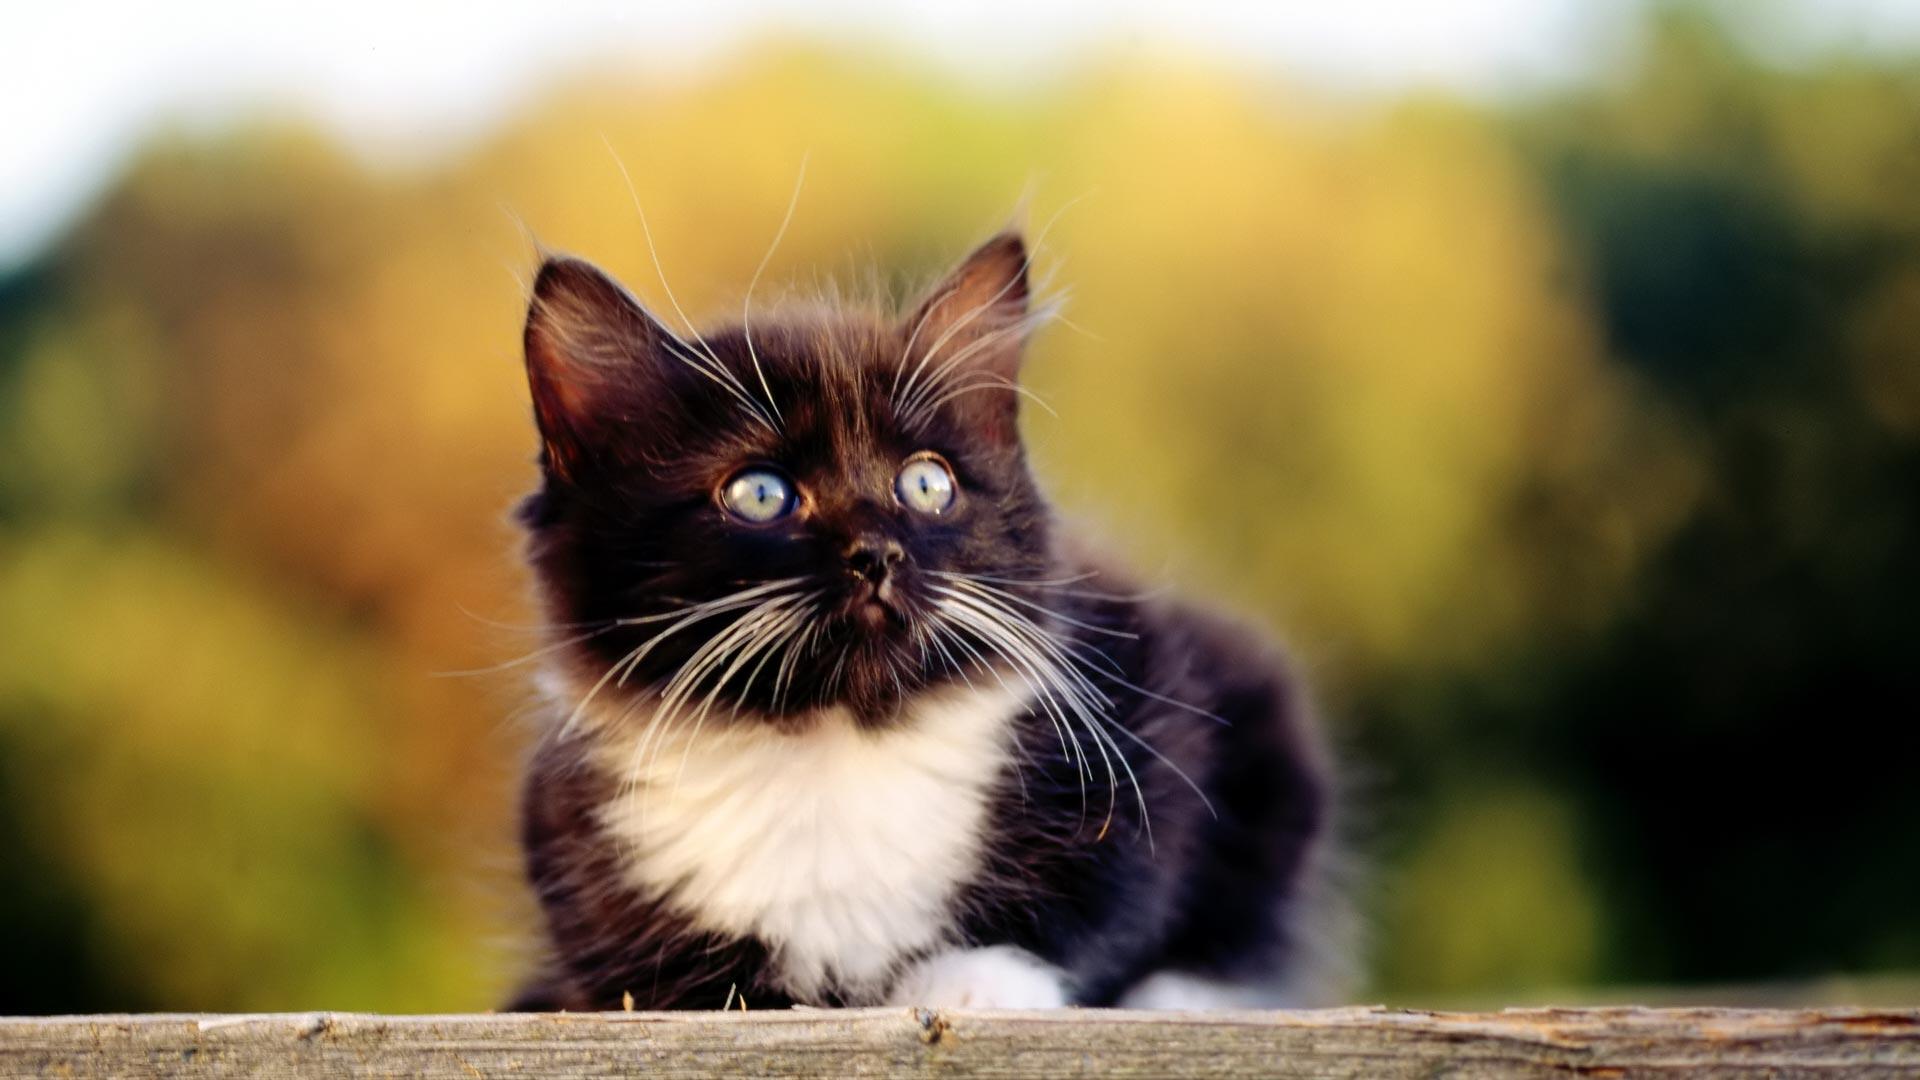 kitten wallpaper widescreen - wallpapersafari